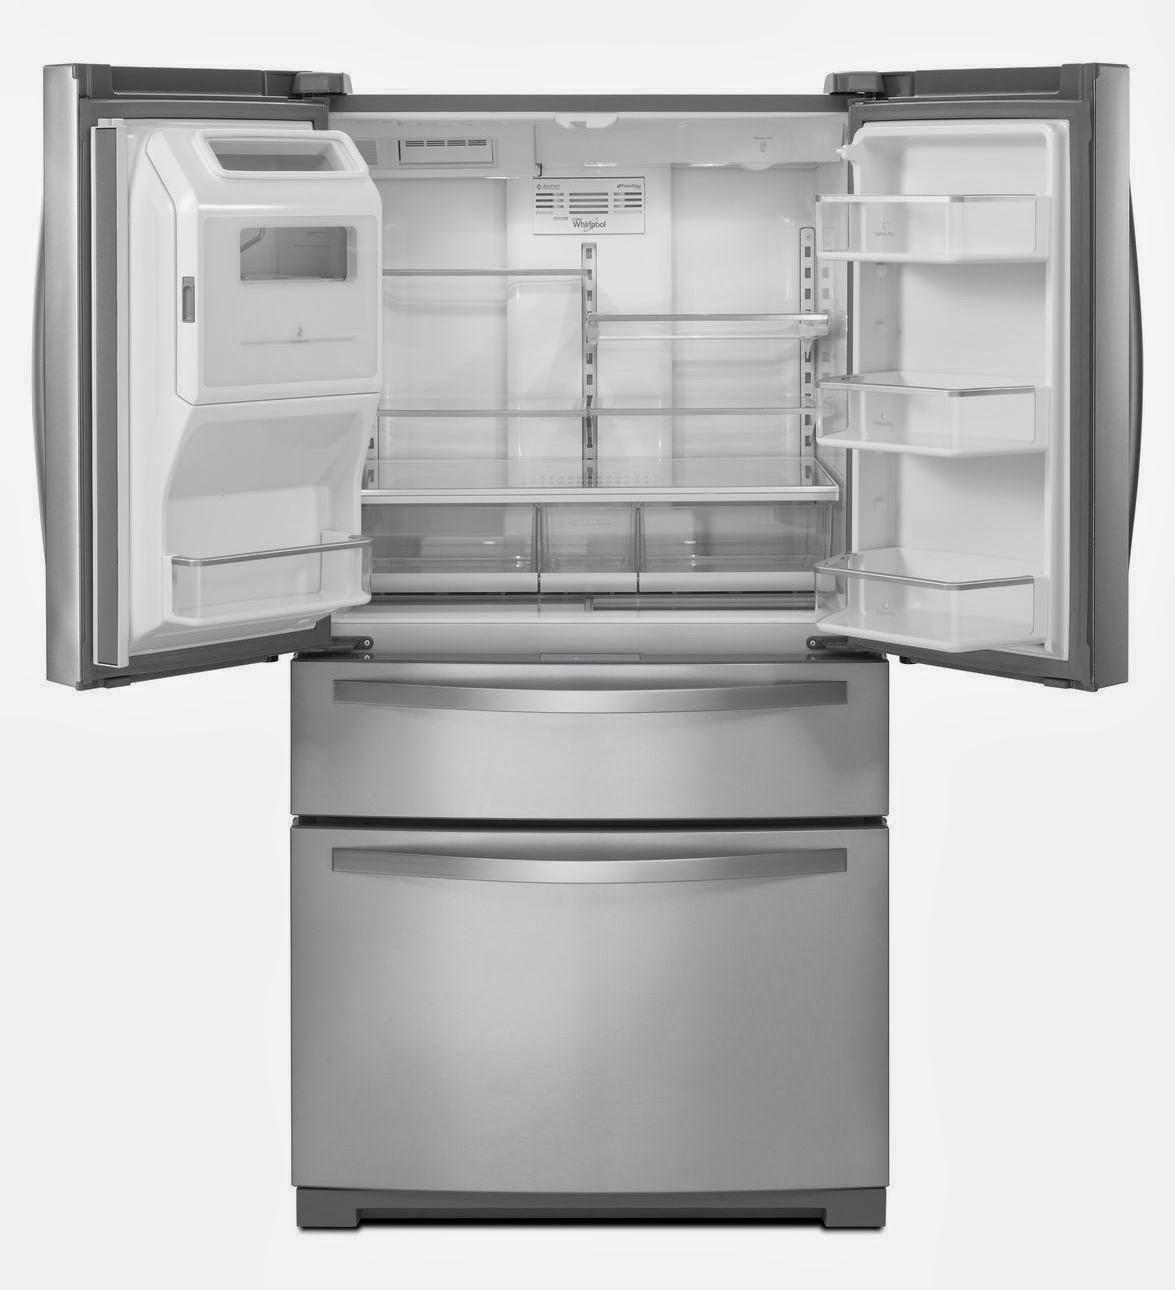 Whirlpool Refrigerator Brand Wrx988sibm